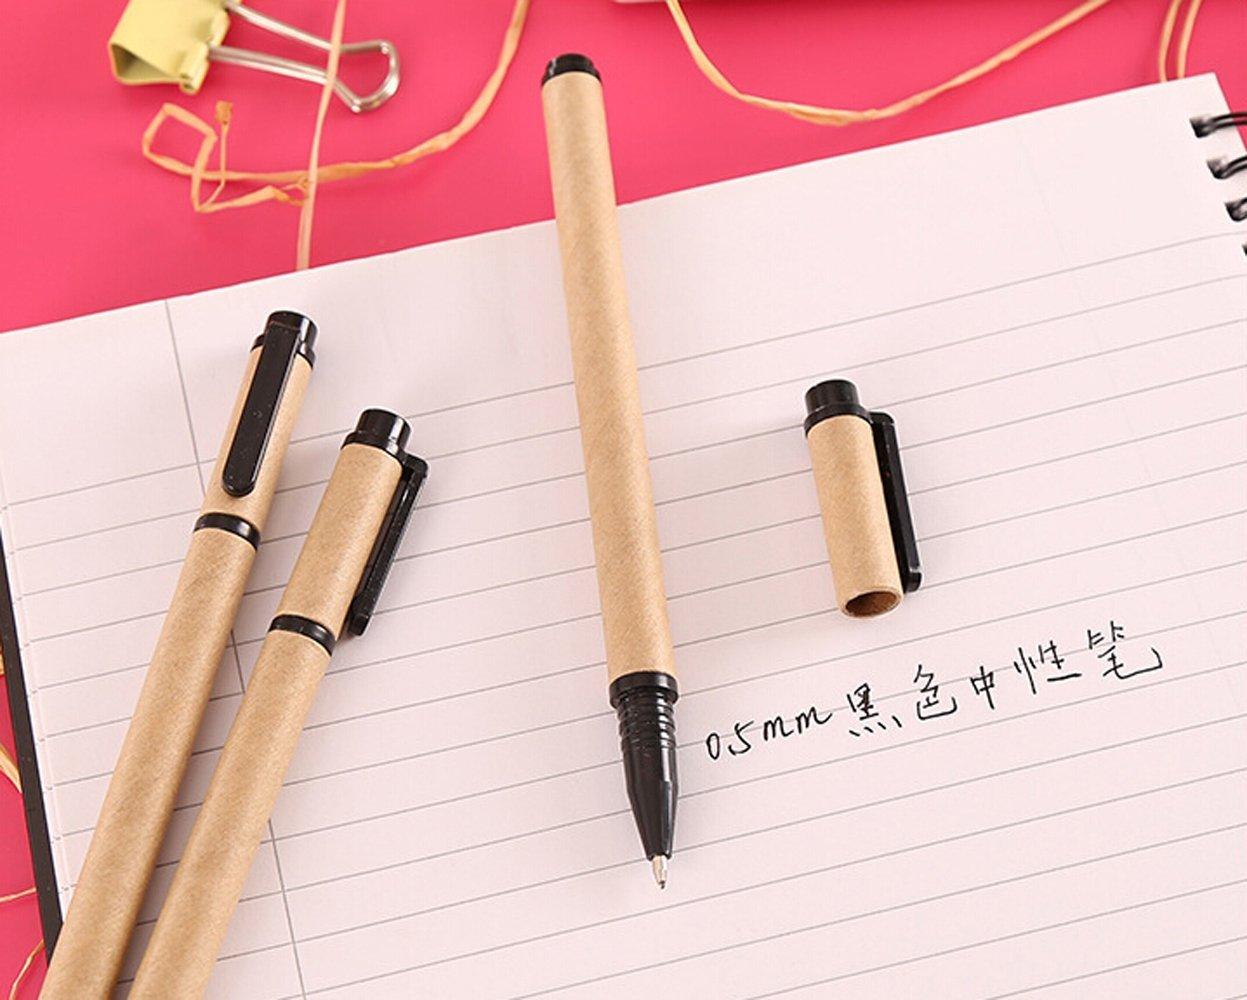 10pcs Writing Gel Ink Pen Set Kraft Paper Barrel 0.5mm Fine Point Pen,Black Ink,Pen Refill Replaceable, Anti Skip and Smoothing Writing